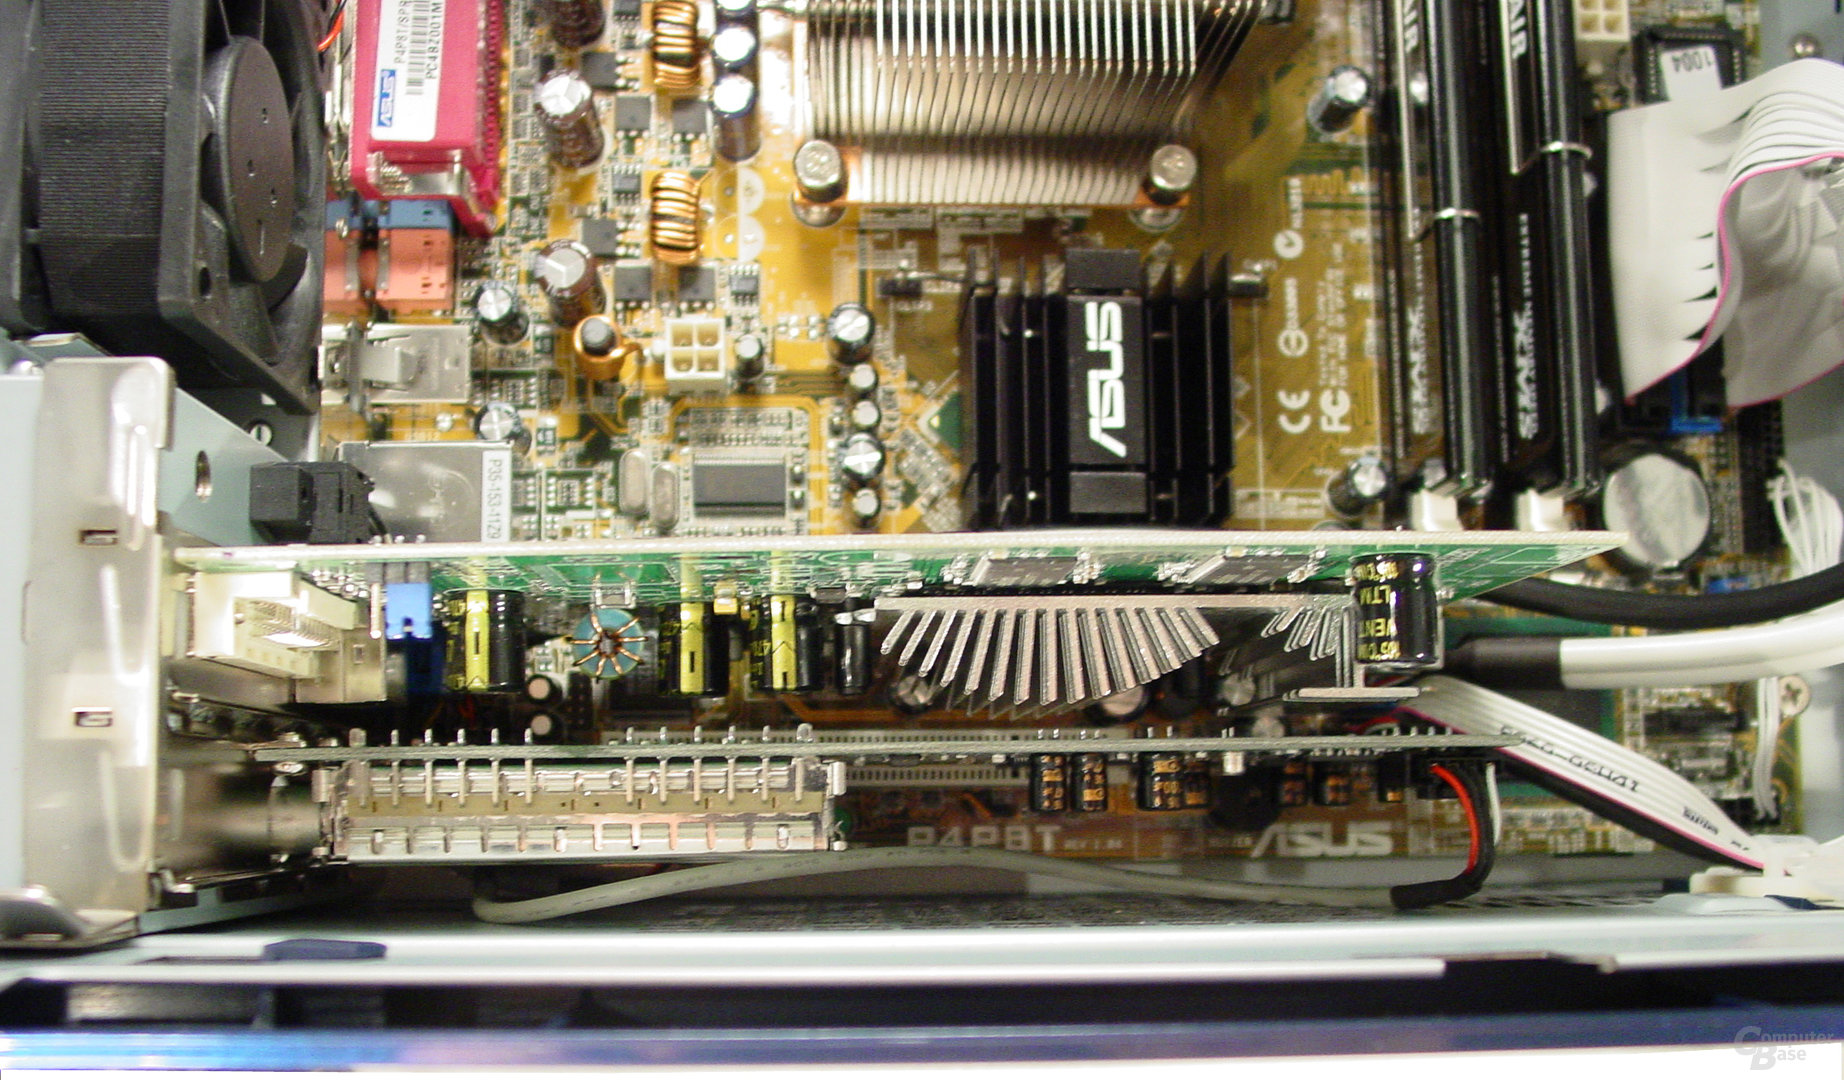 Asus S-presso S1-P111 Deluxe - Installation - TV-Karte und Radeon 9600